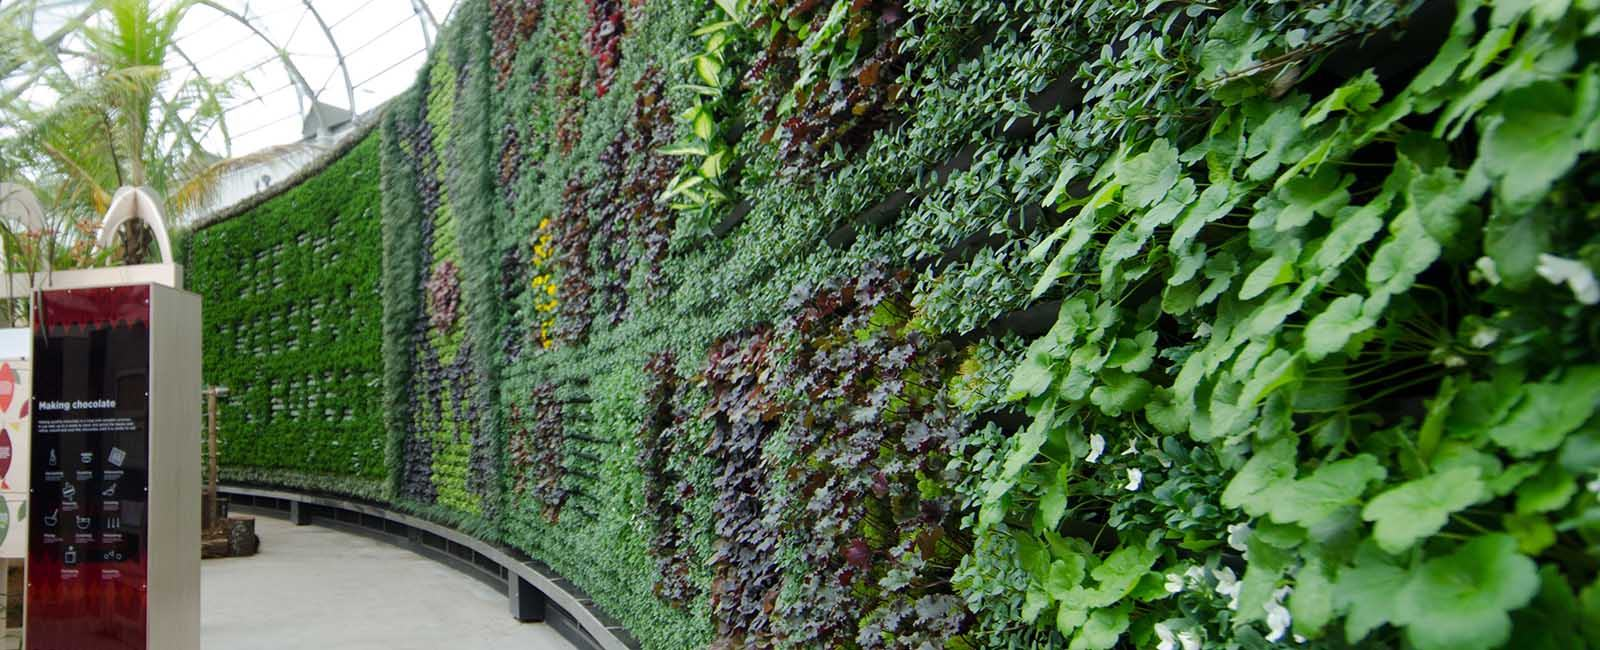 royal botanical gardens green wall